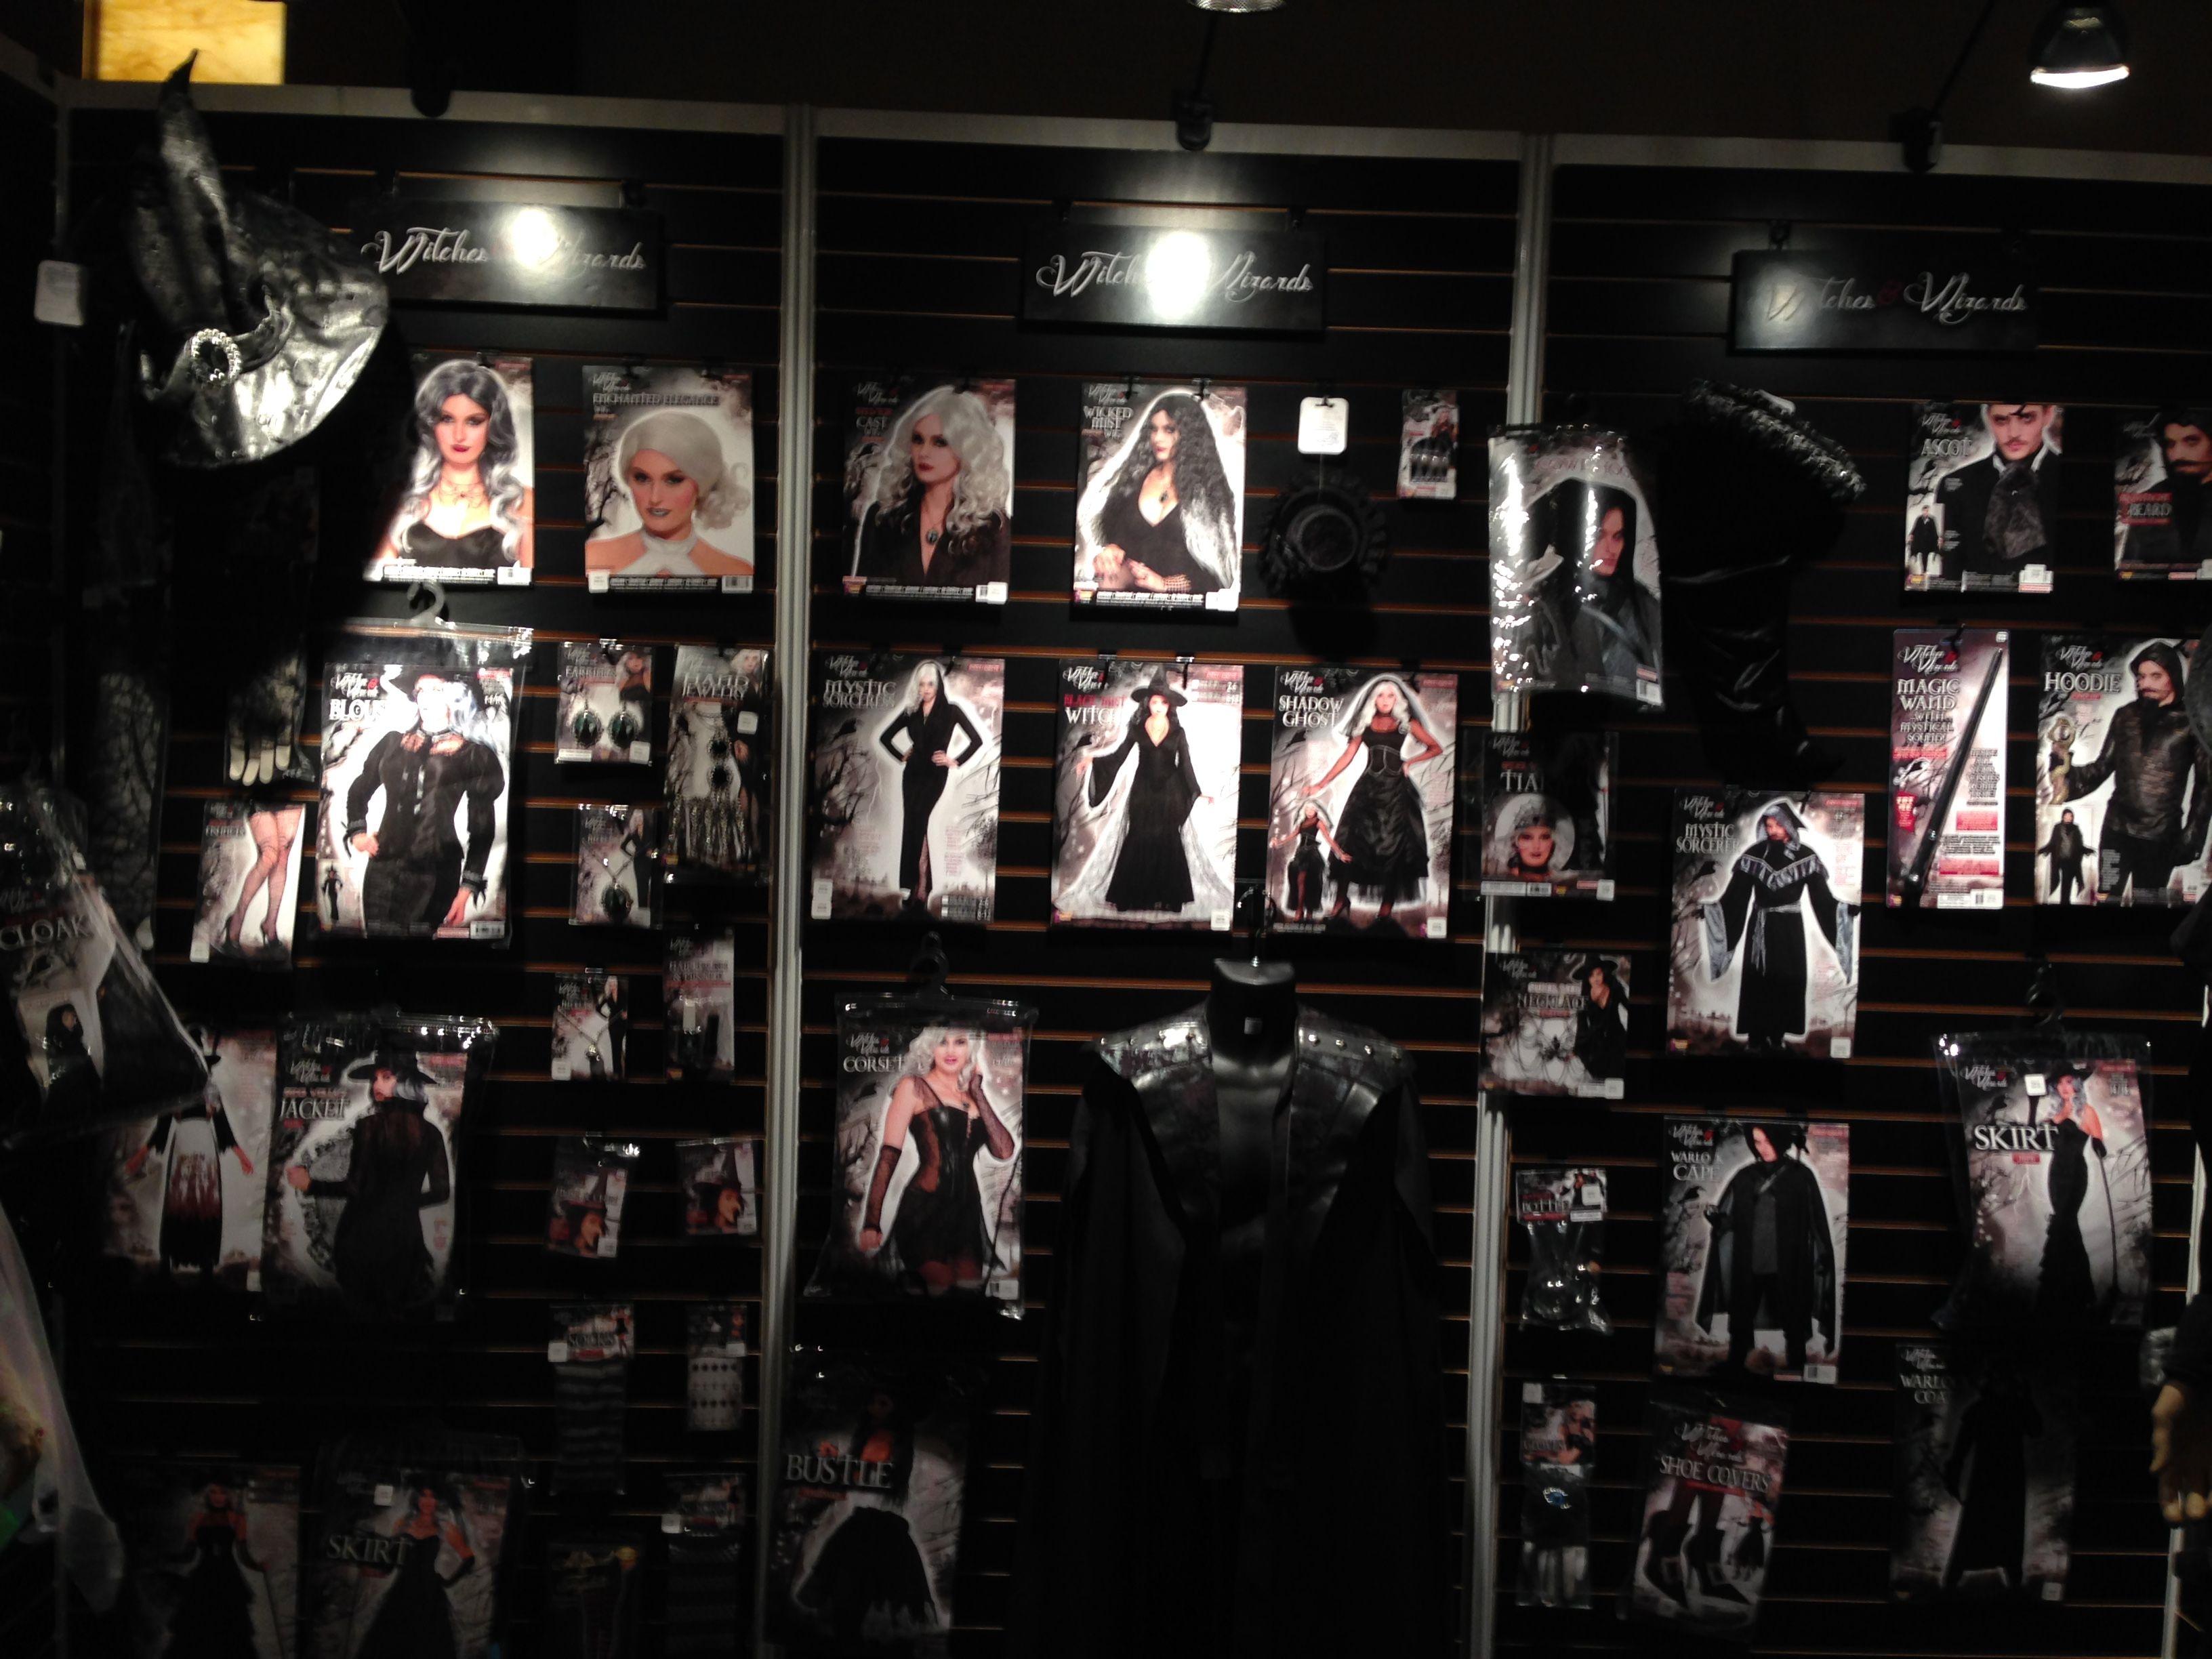 Lots of costumes in Las Vegas! Cool halloween costumes